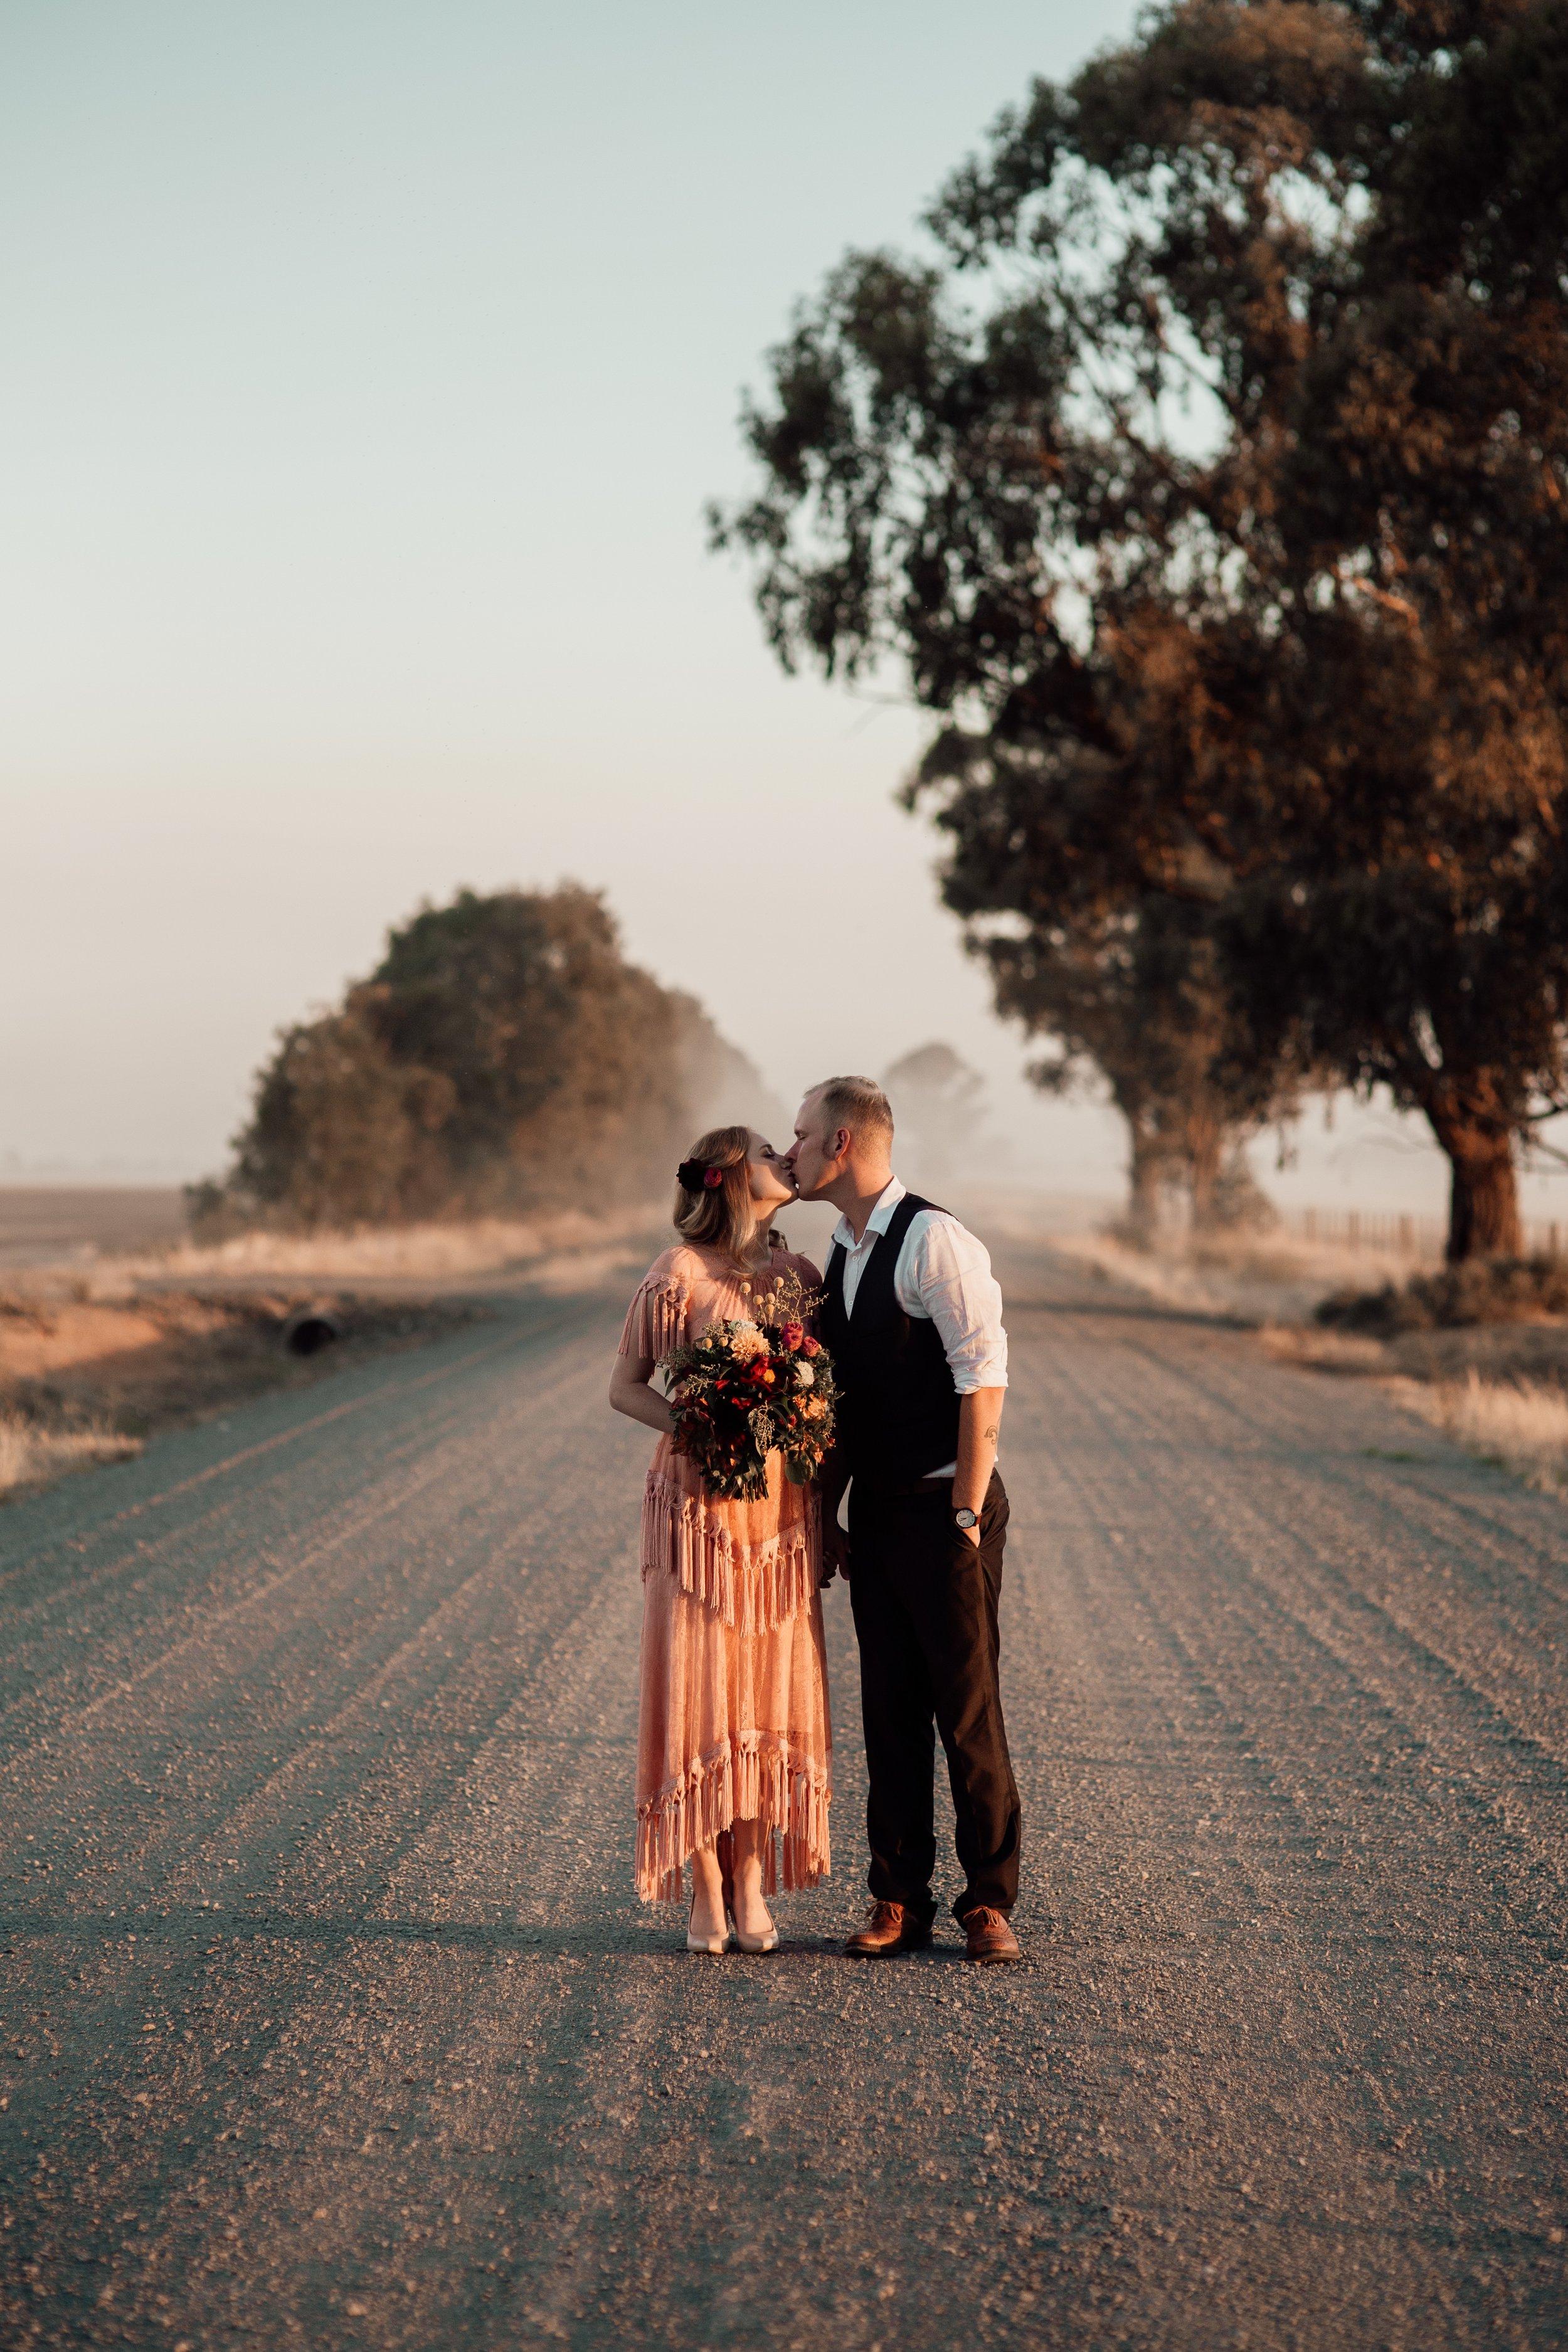 mickalathomas_puremacphotography_weddingphotographer_couplephotographer_Sheppartonphotographer_2148.jpg